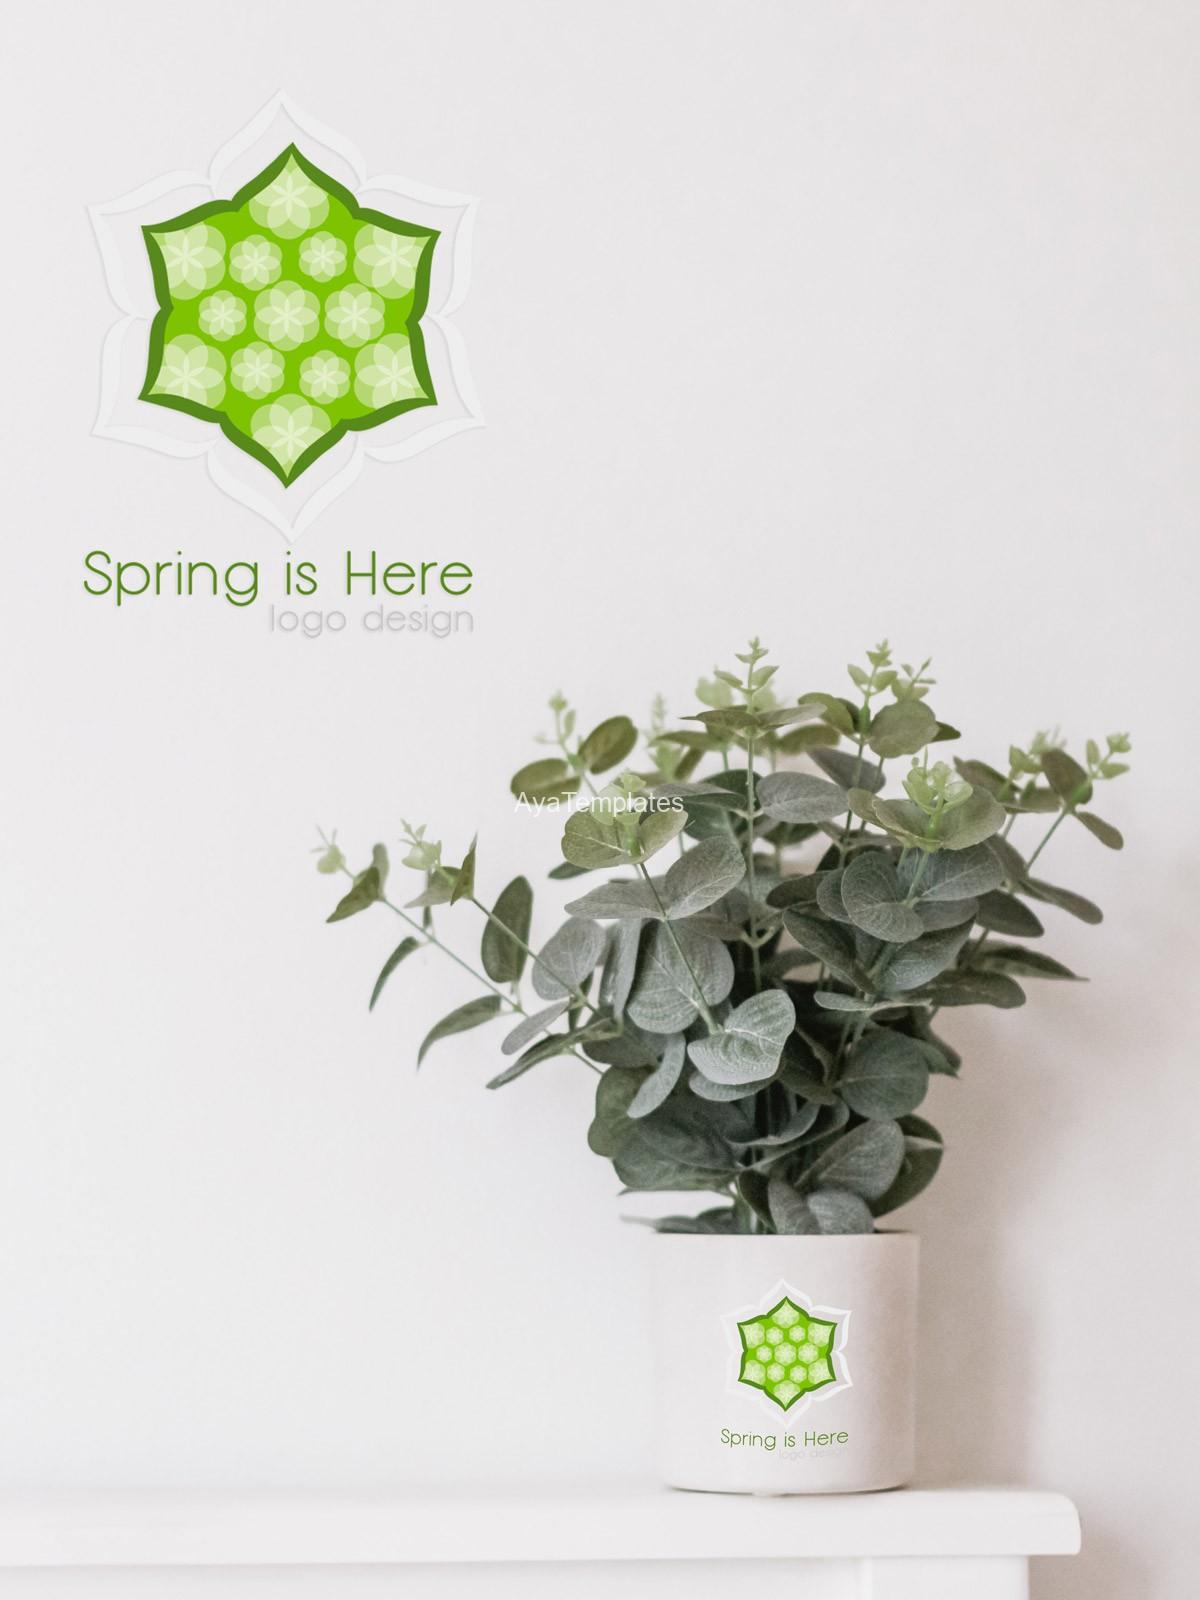 spring-is-here-logo-design-brand-identity-mockup